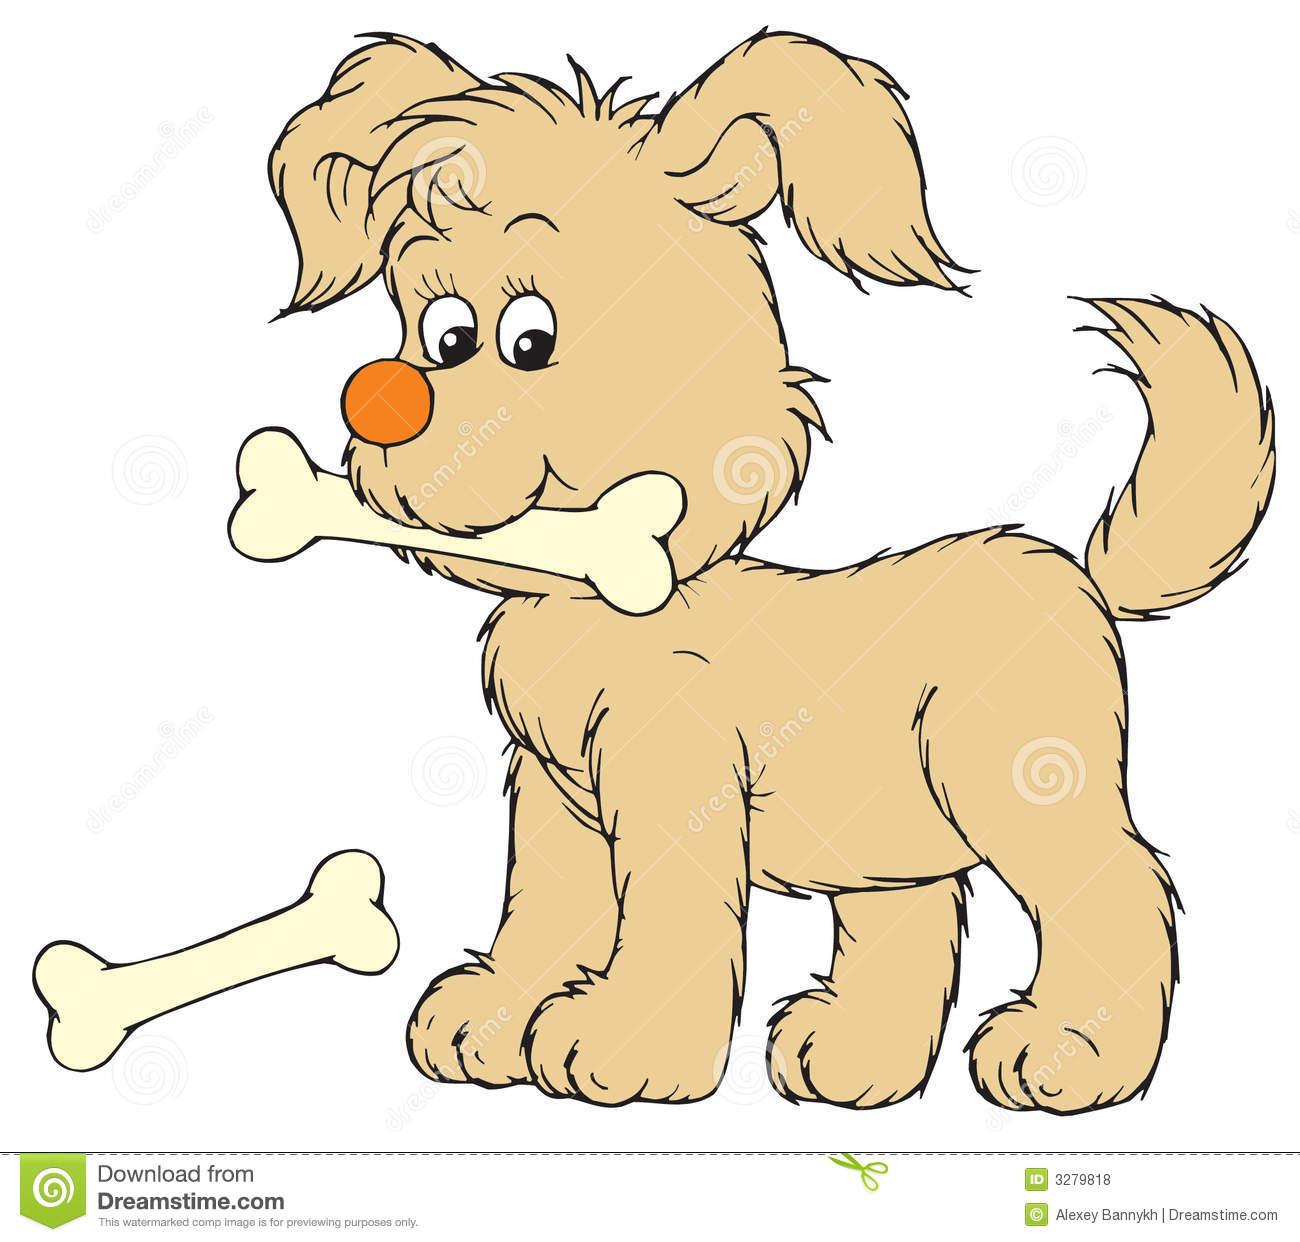 Clipart Puppy & Puppy Clip Art Images.